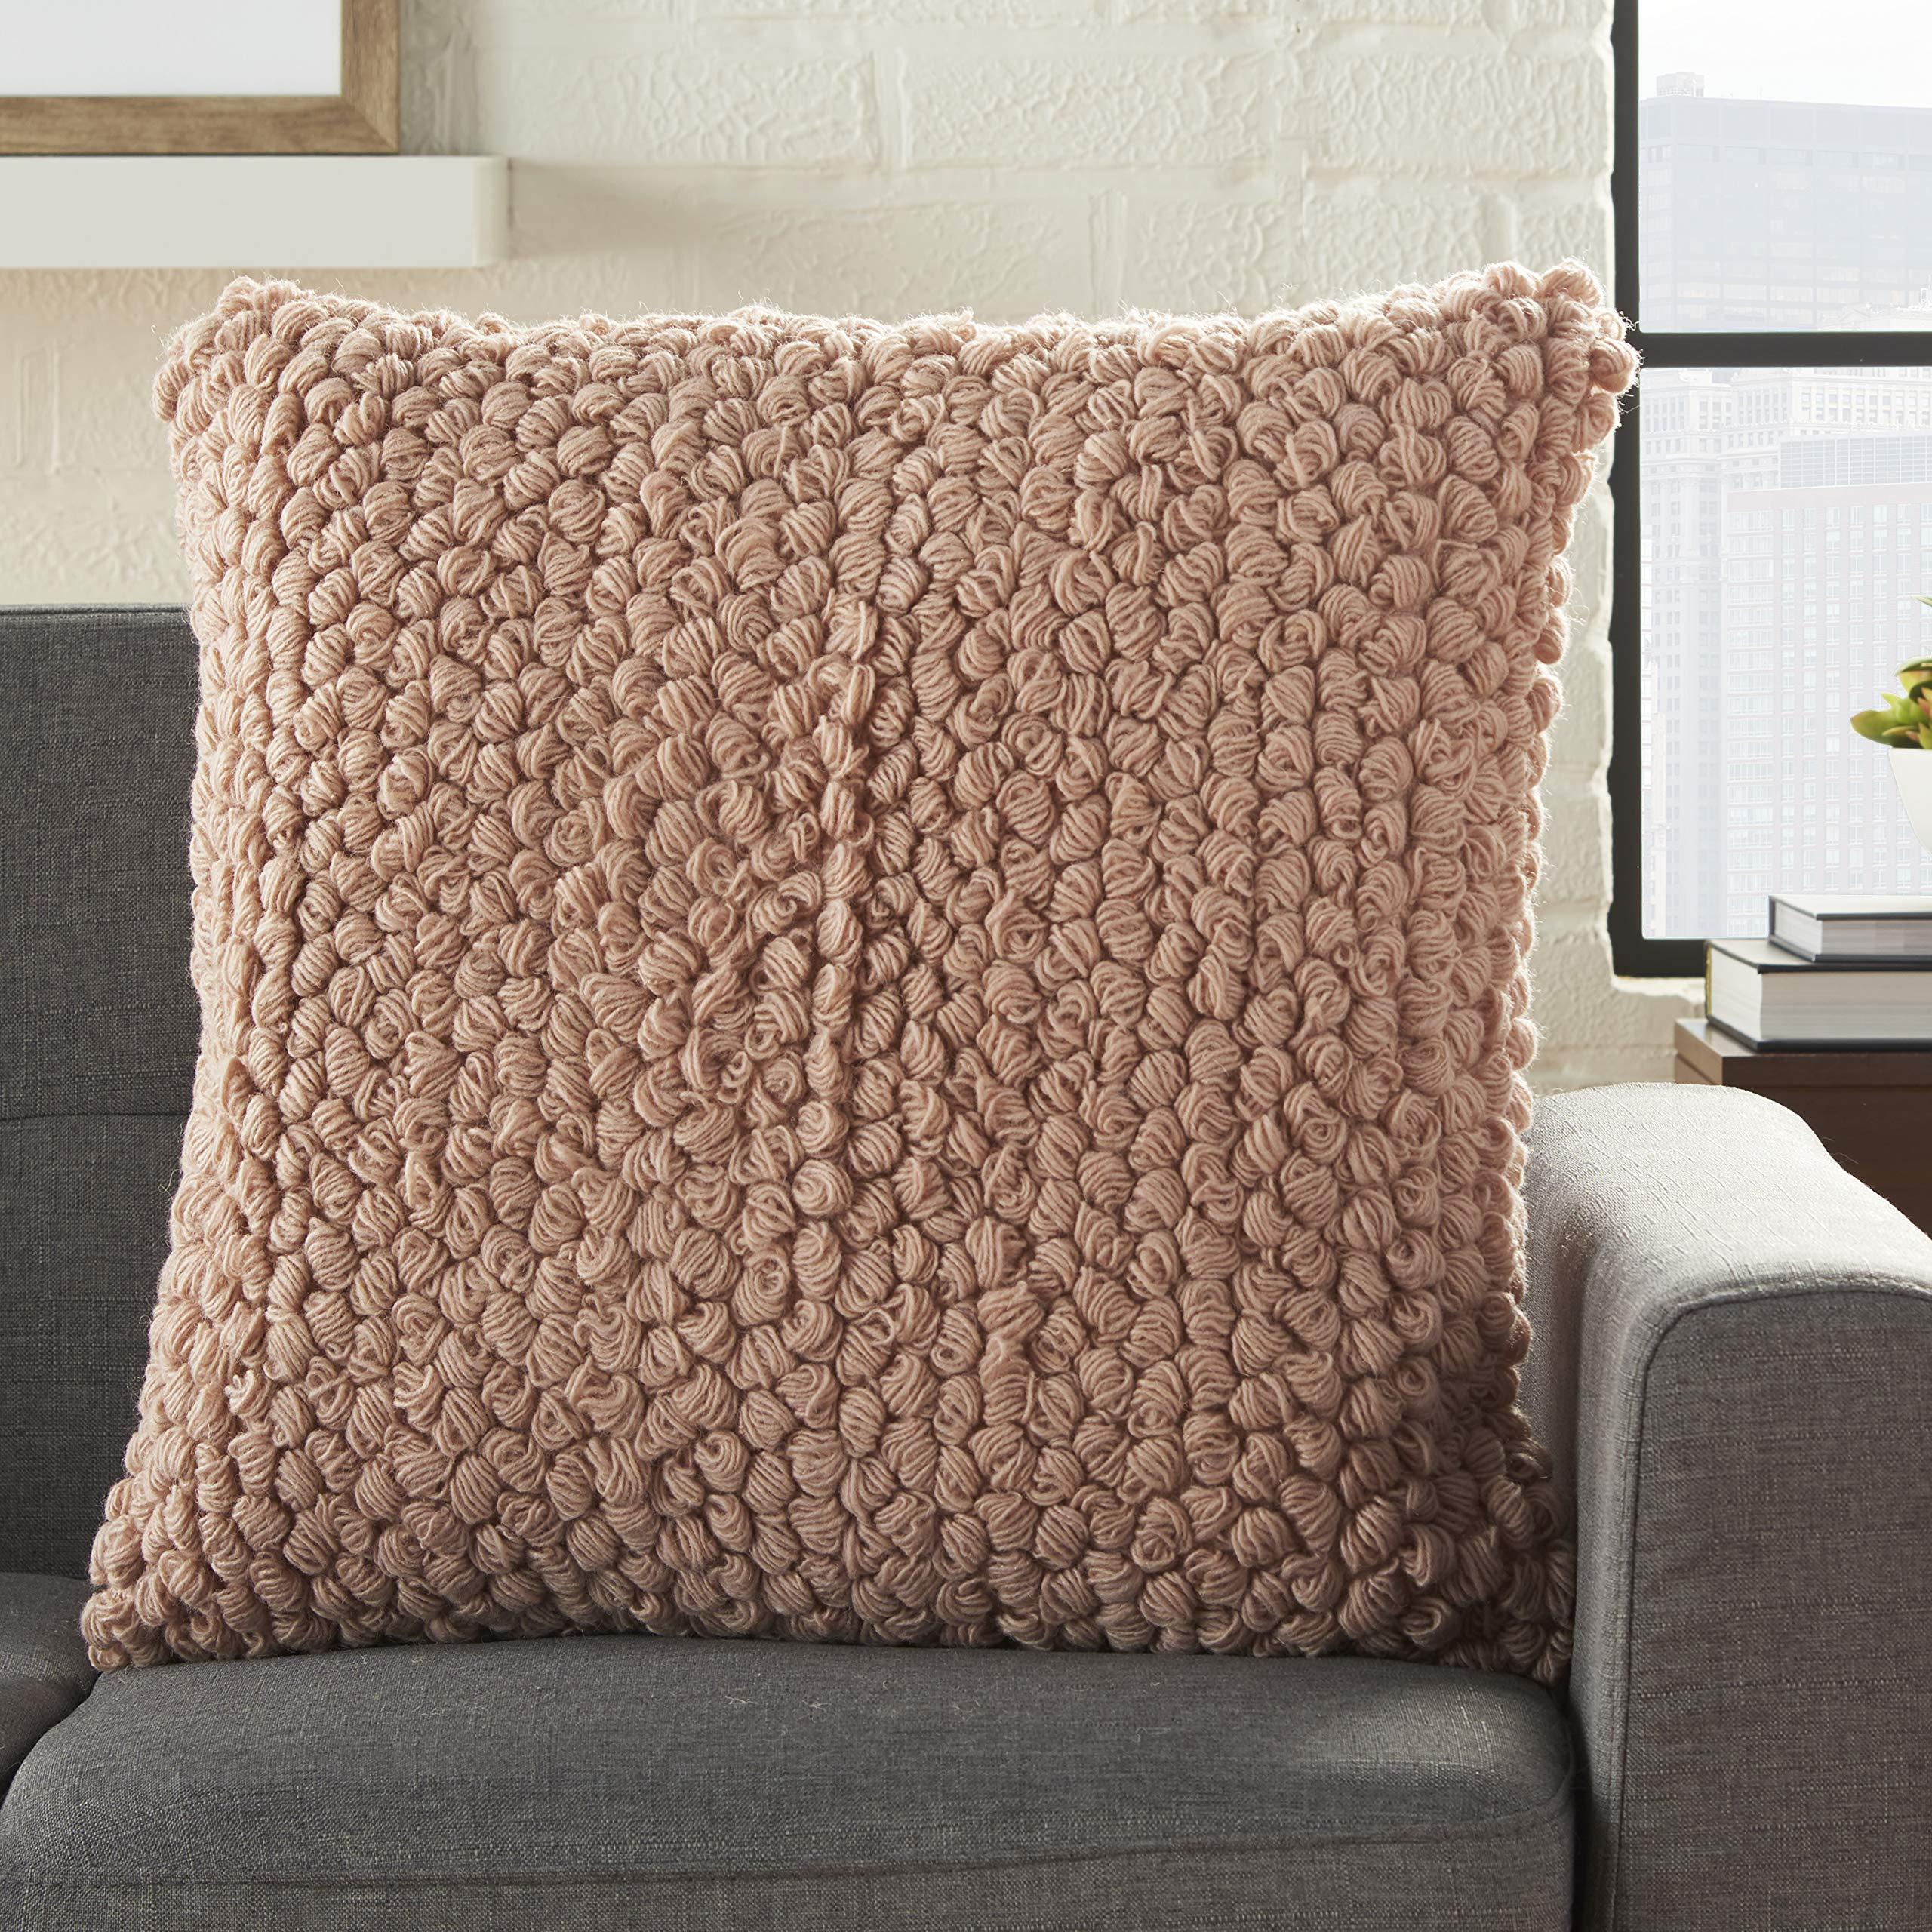 Mina Victory Life Styles Blush Thin Group Loops Throw Pillow 20'' x 20''